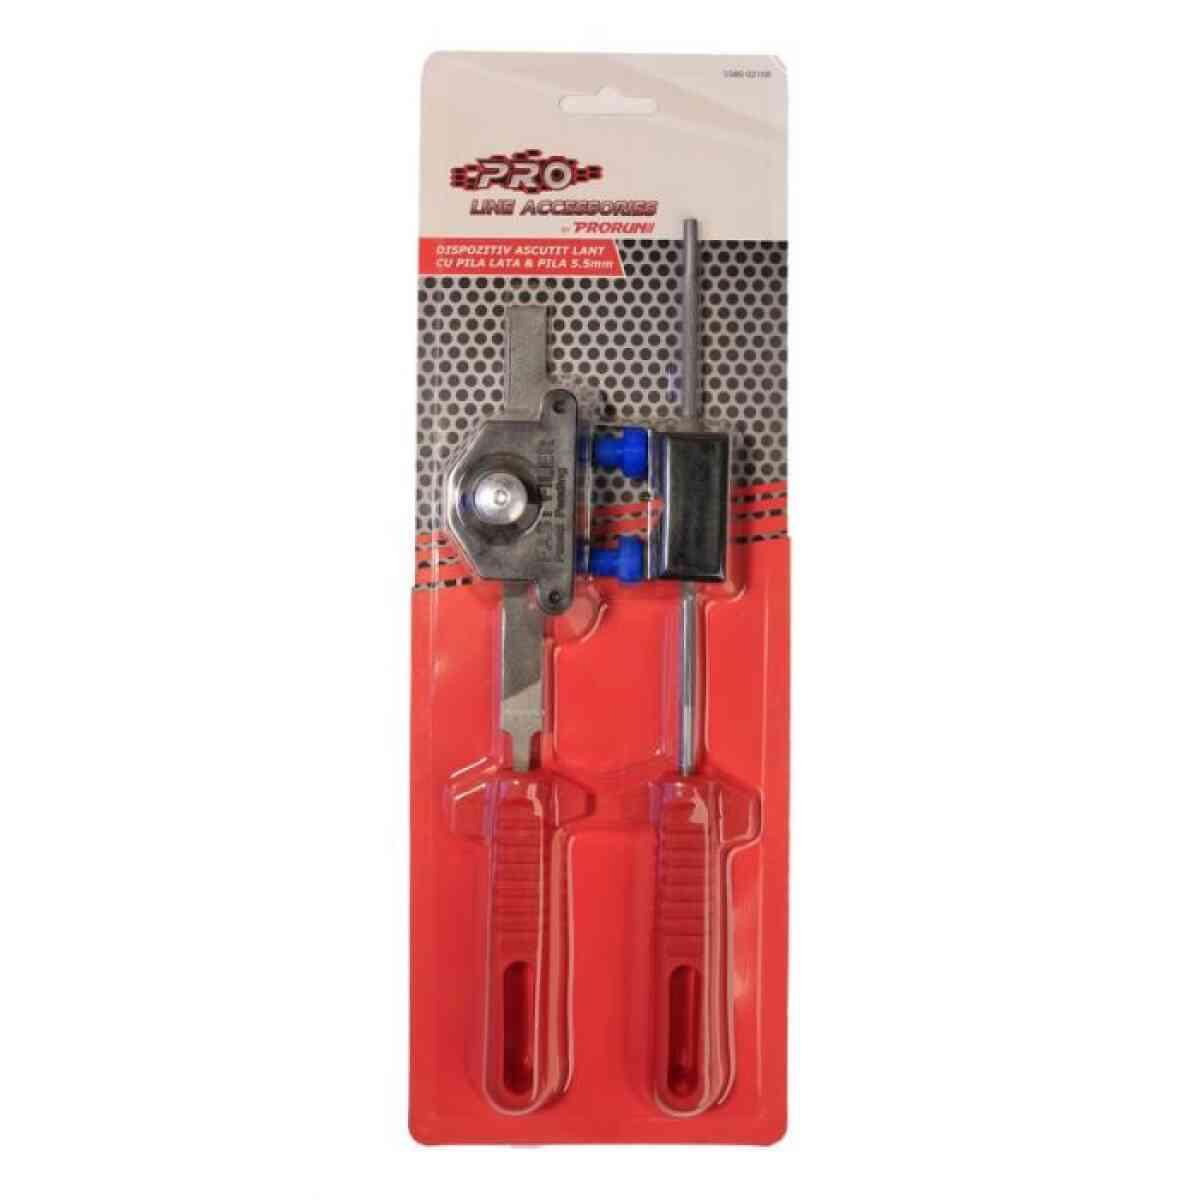 5580 02108 dispozitiv ascutit lant cu pila lata pila 4 8mm prorun o mac.ro 1 1 1